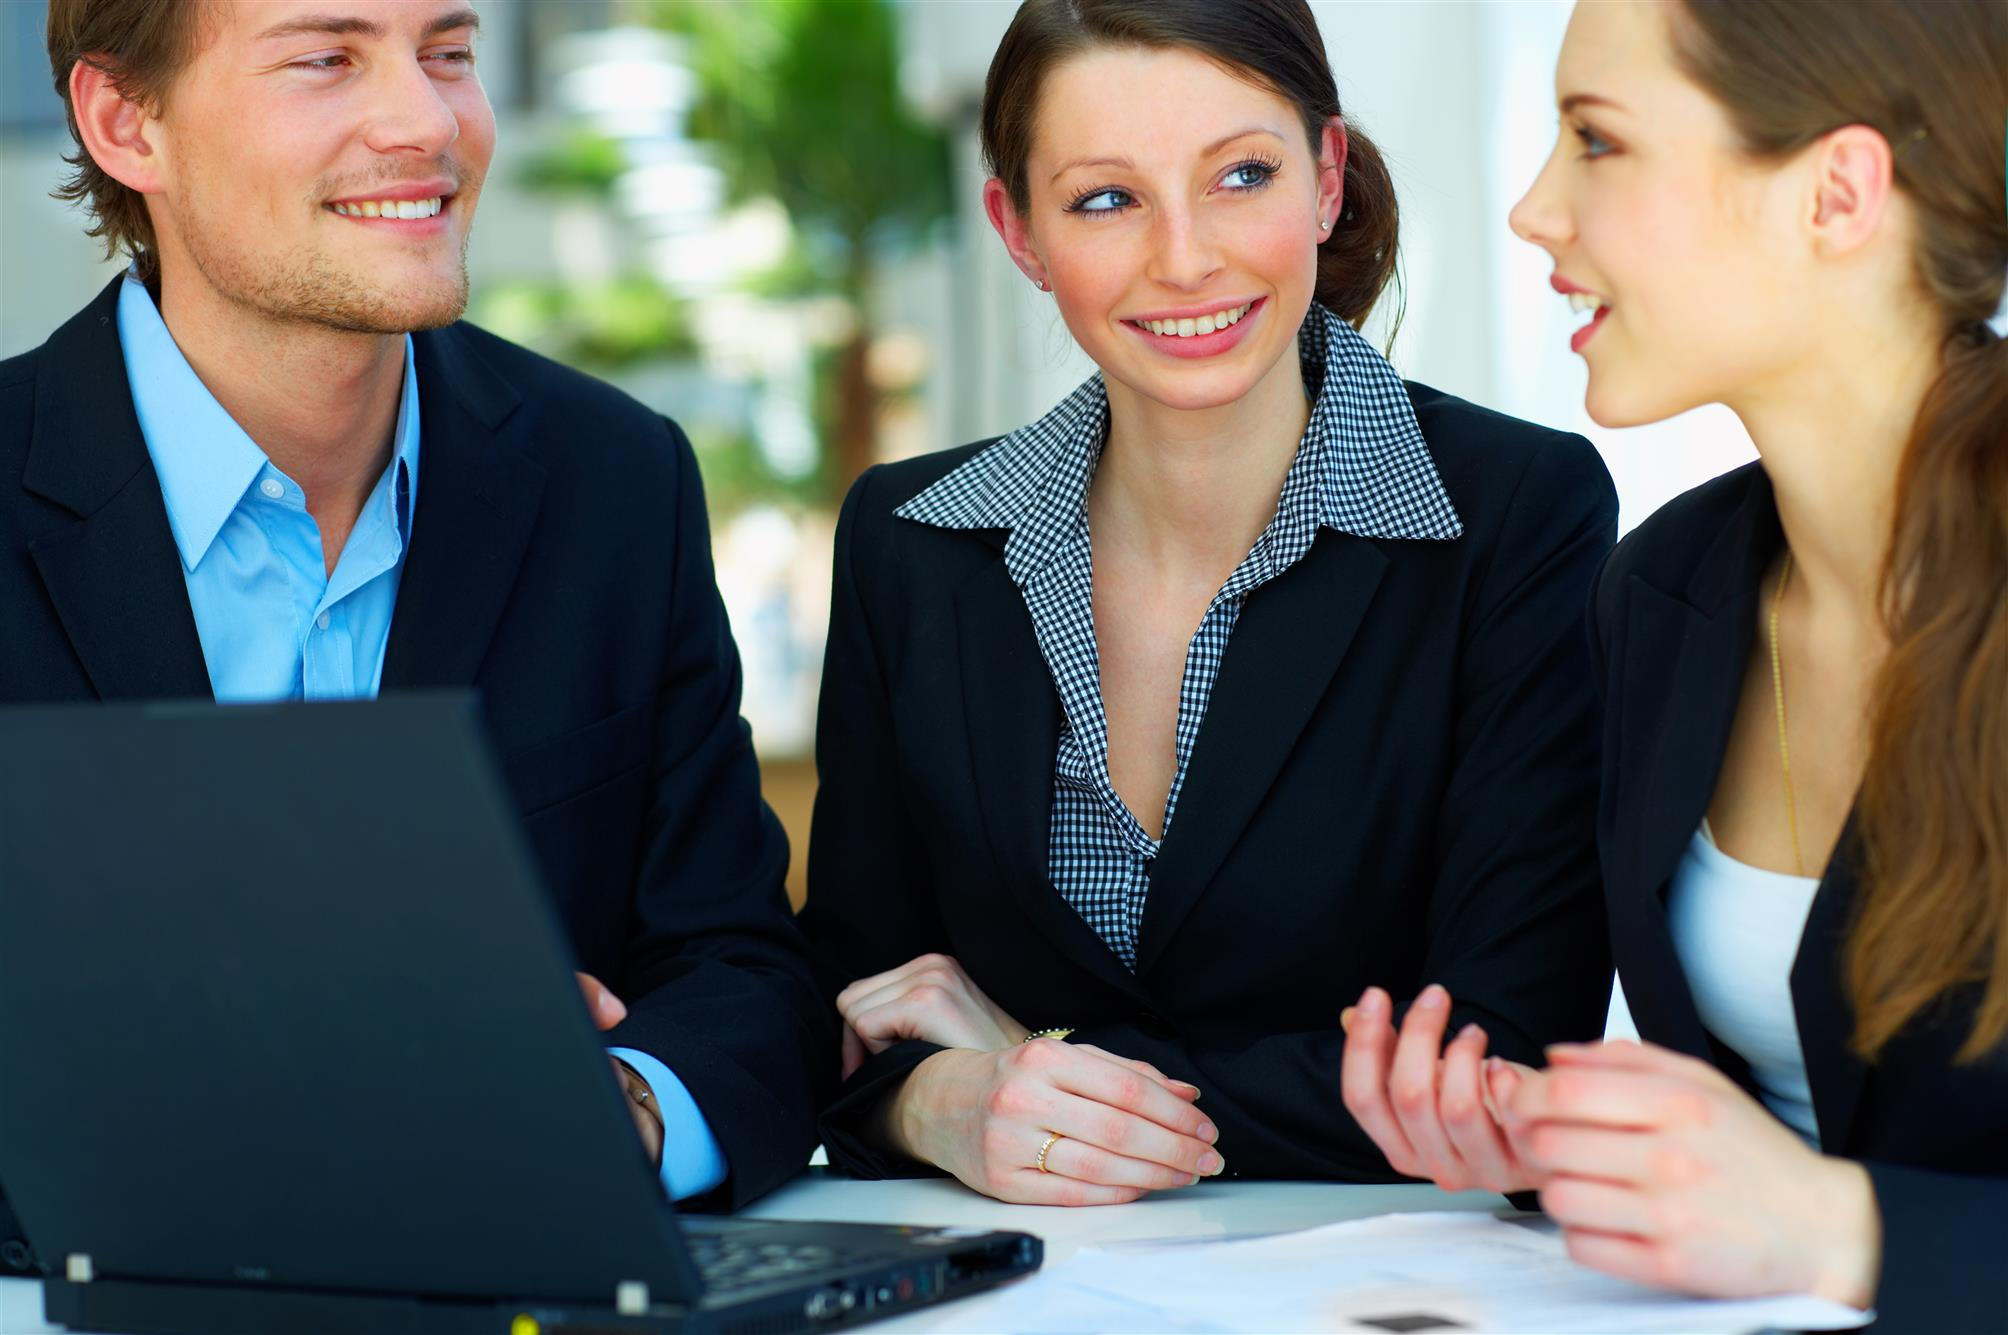 Business Team (Meeting)